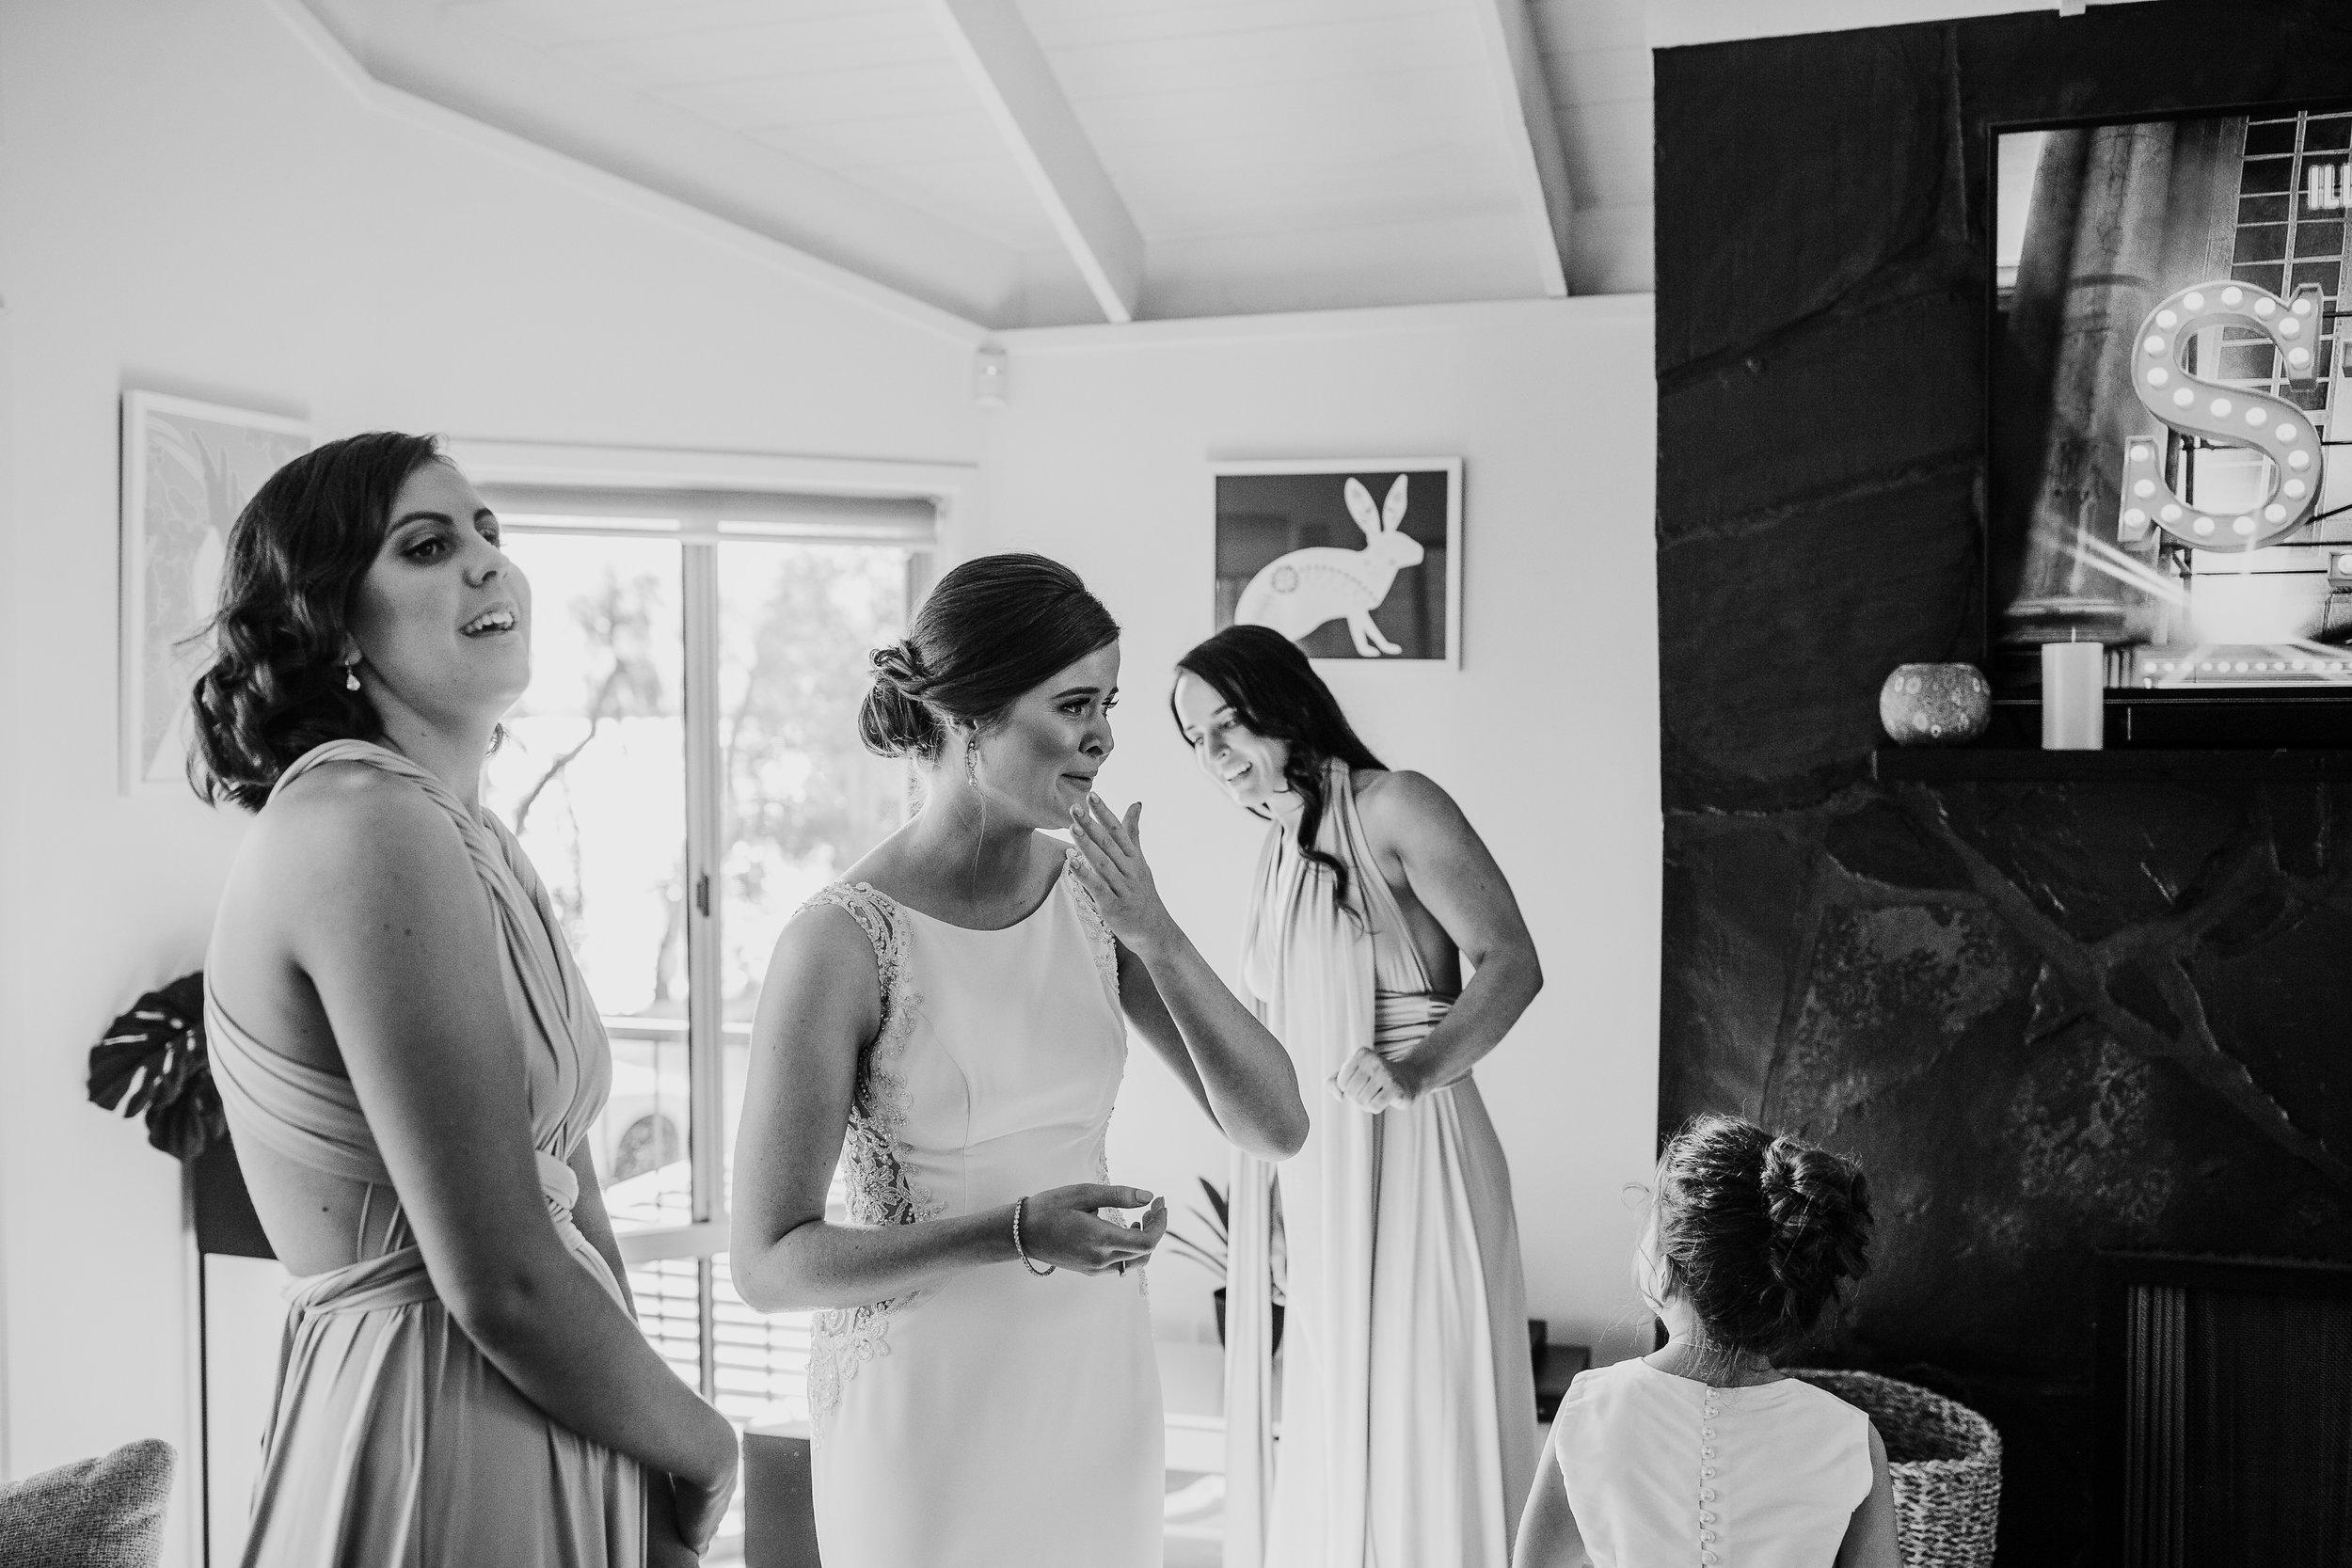 mickalathomas_puremacphotography_weddingphotographer_couplephotographer_Sheppartonphotographer_2515.jpg